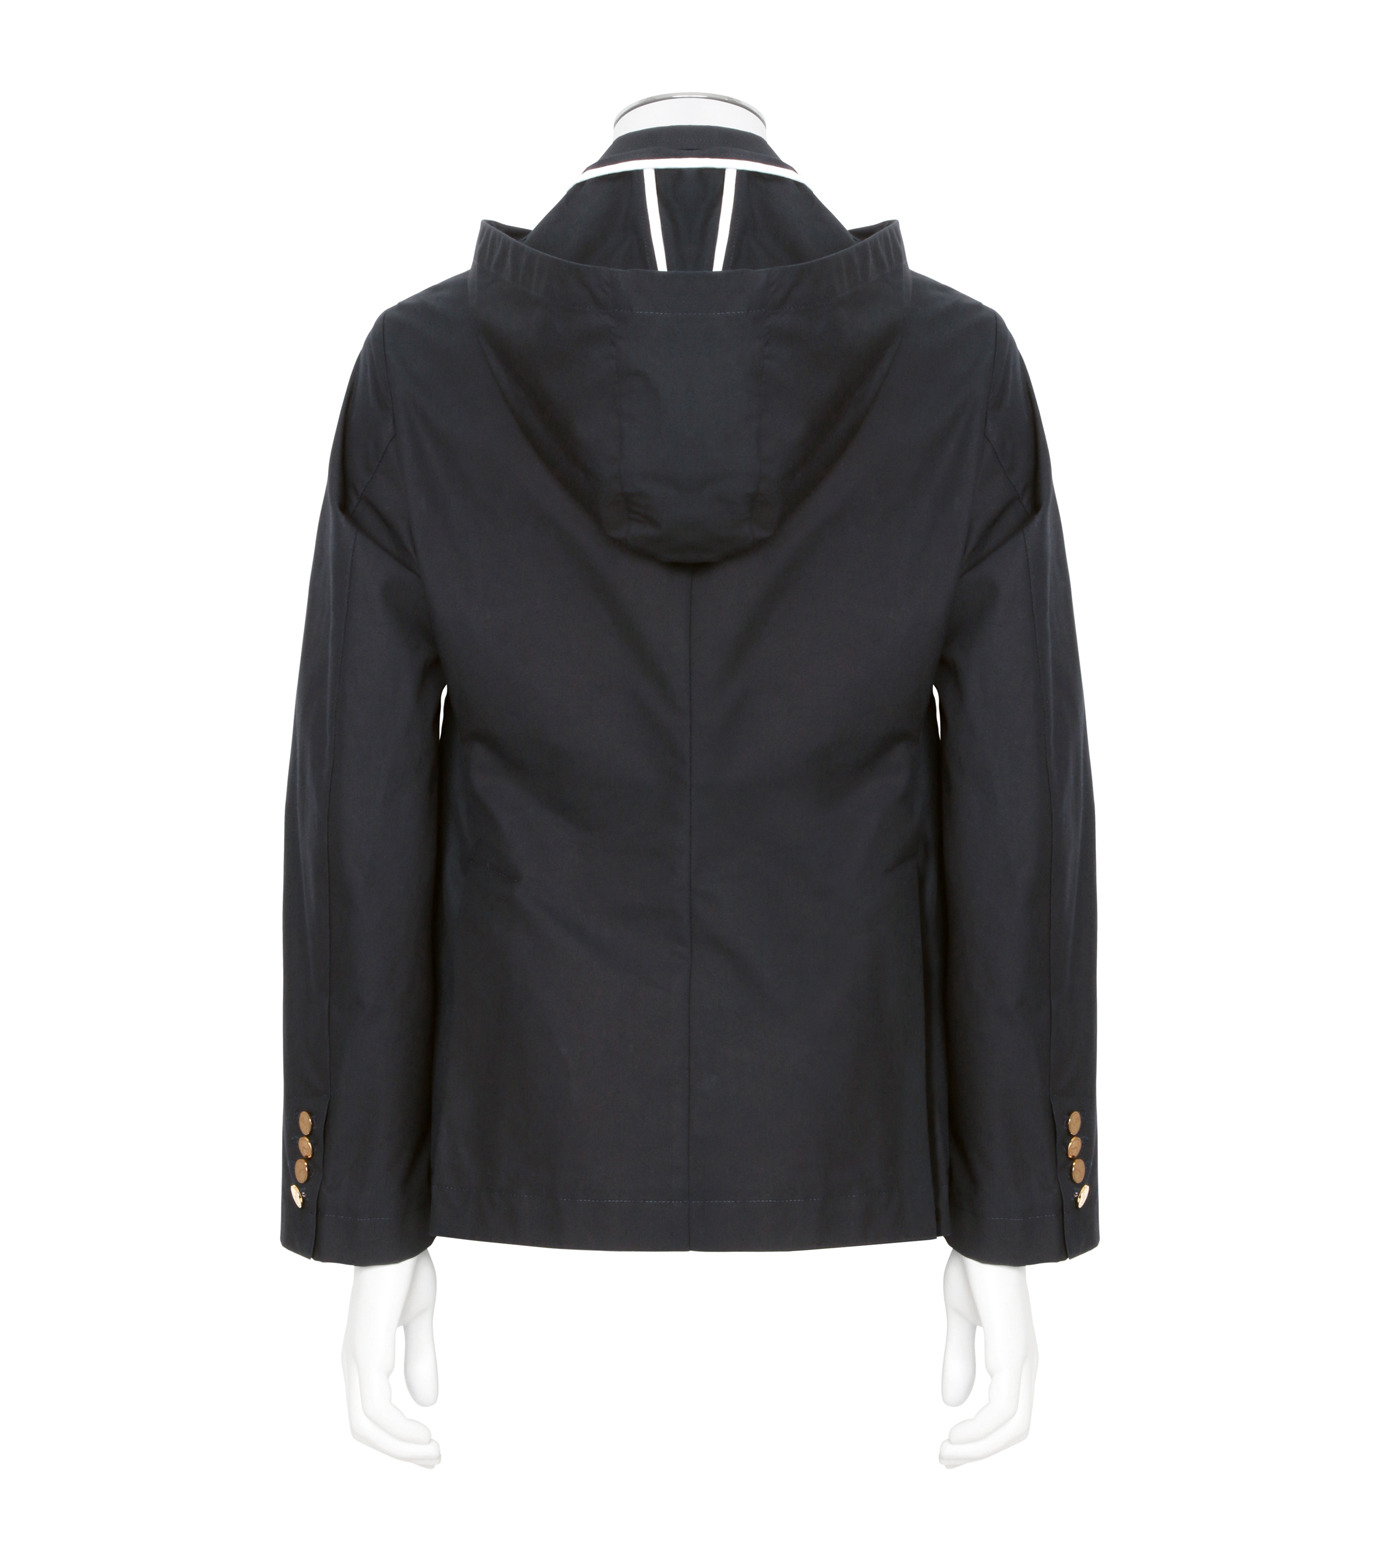 Thom Browne(トムブラウン)のDetachable Hood Jacket-NAVY(ジャケット/jacket)-A0163I20170-93 拡大詳細画像2